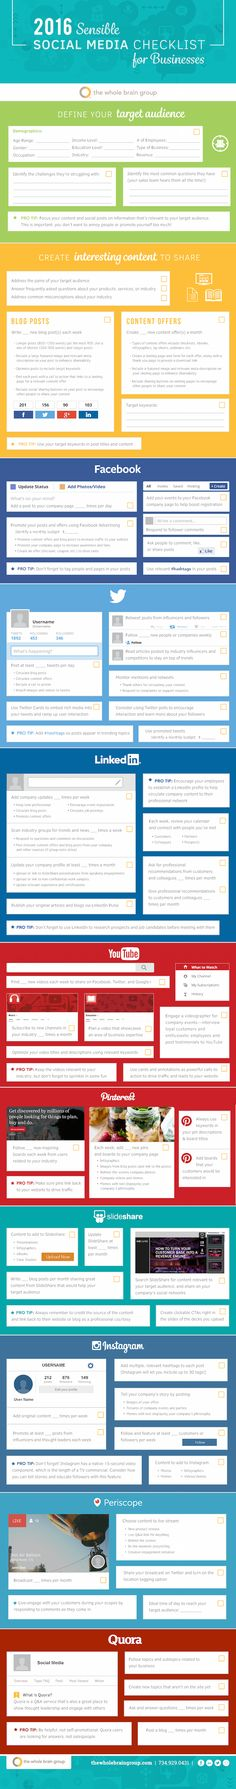 WBG_Social_Media_Checklist_2016.png (650×4929)